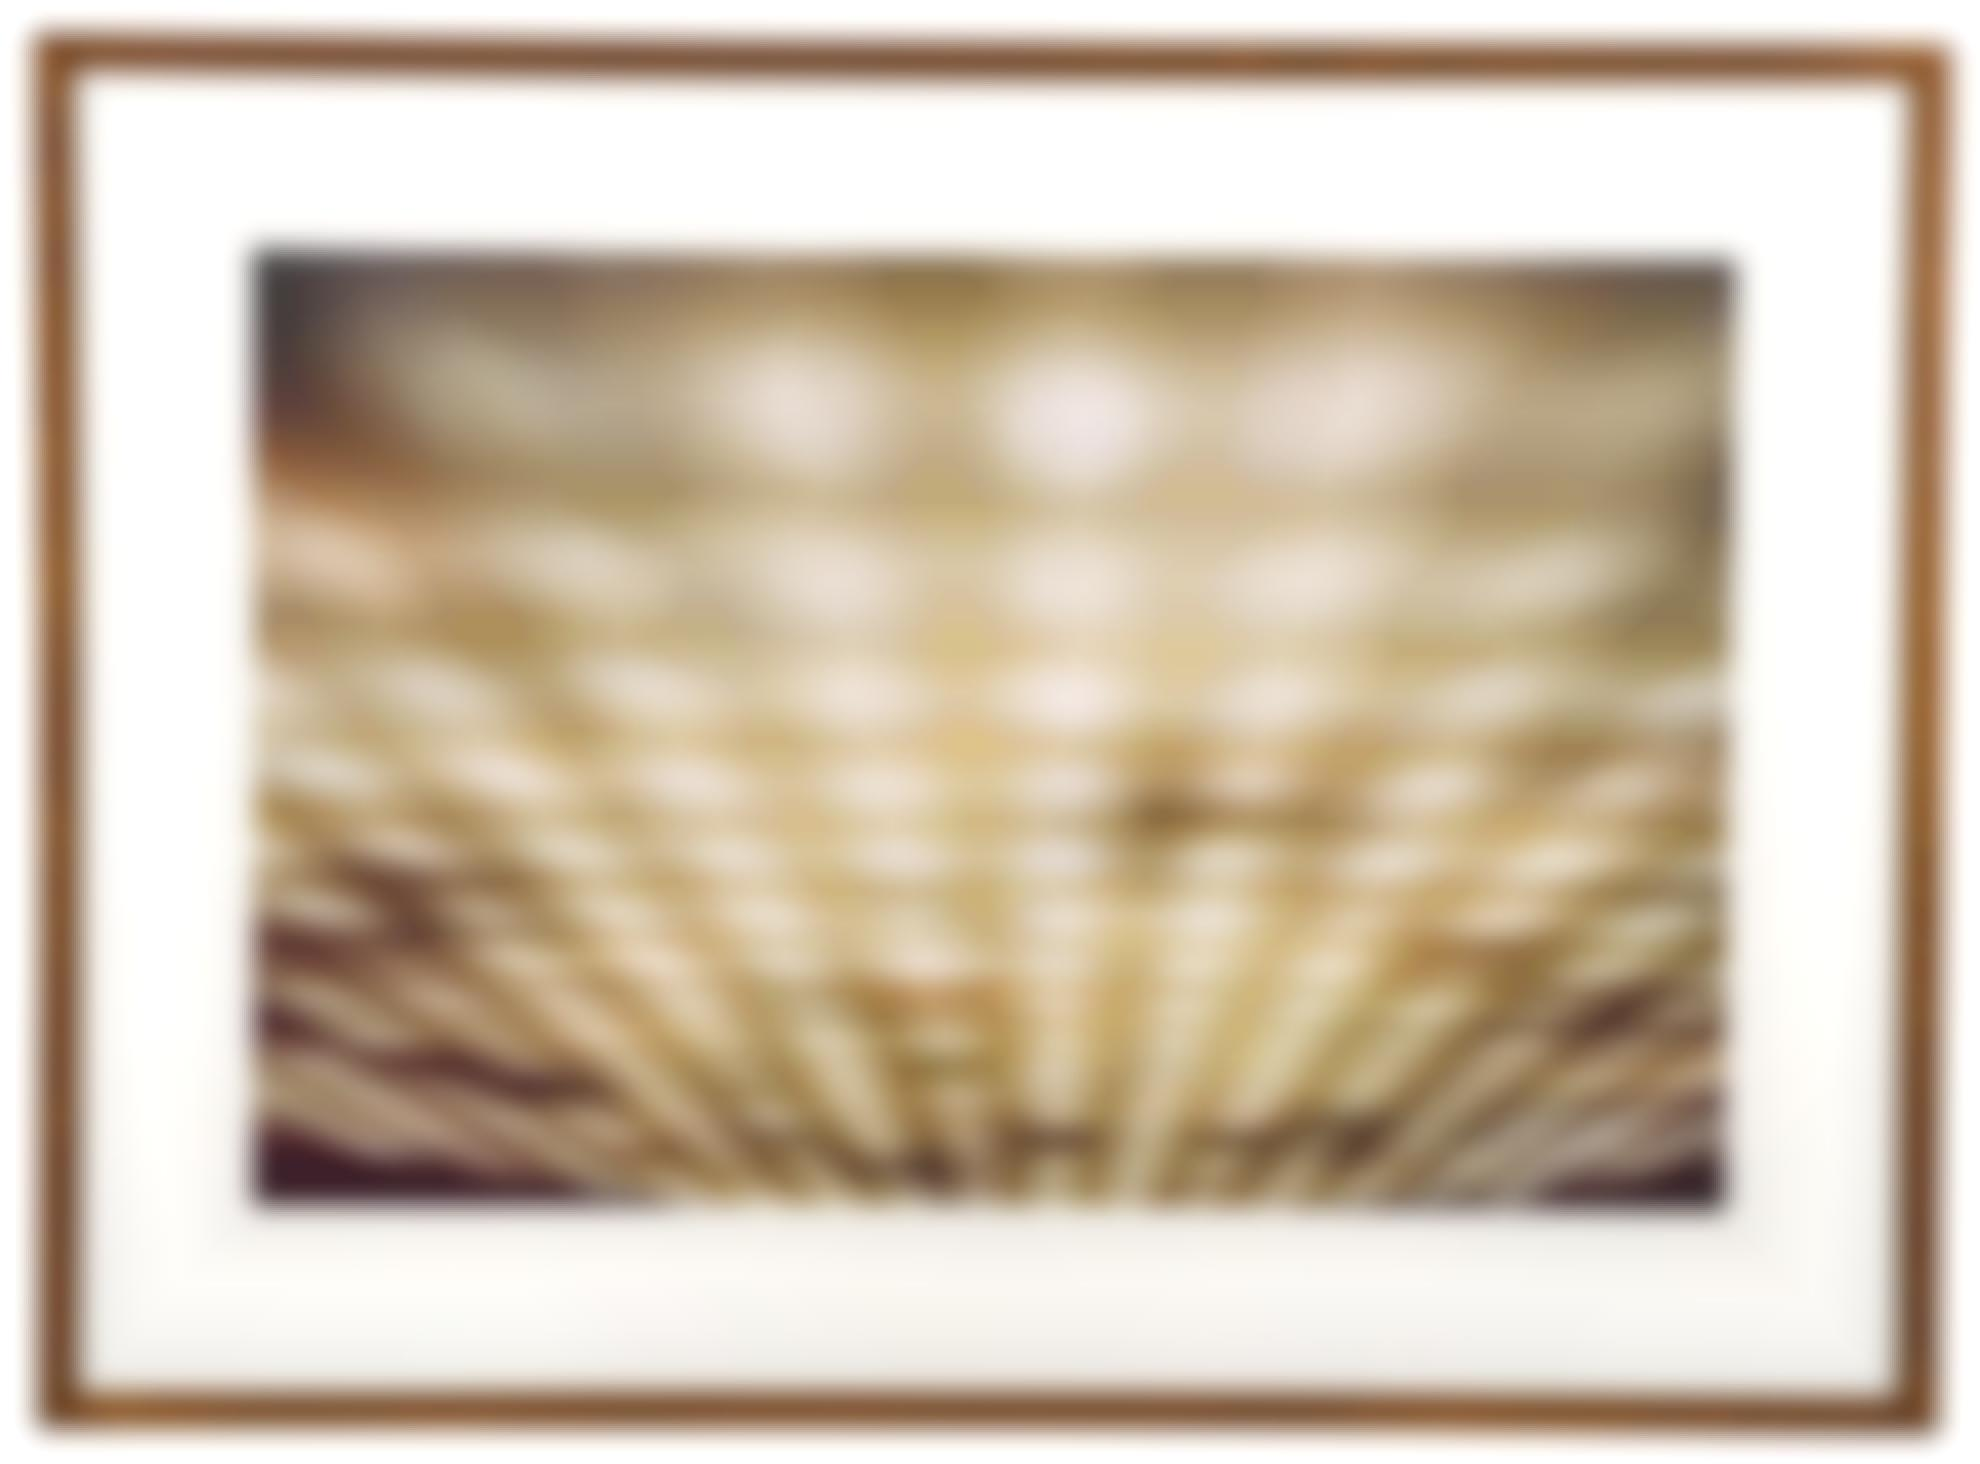 Andreas Gursky-Brasilia, Plenarsaal I-1994